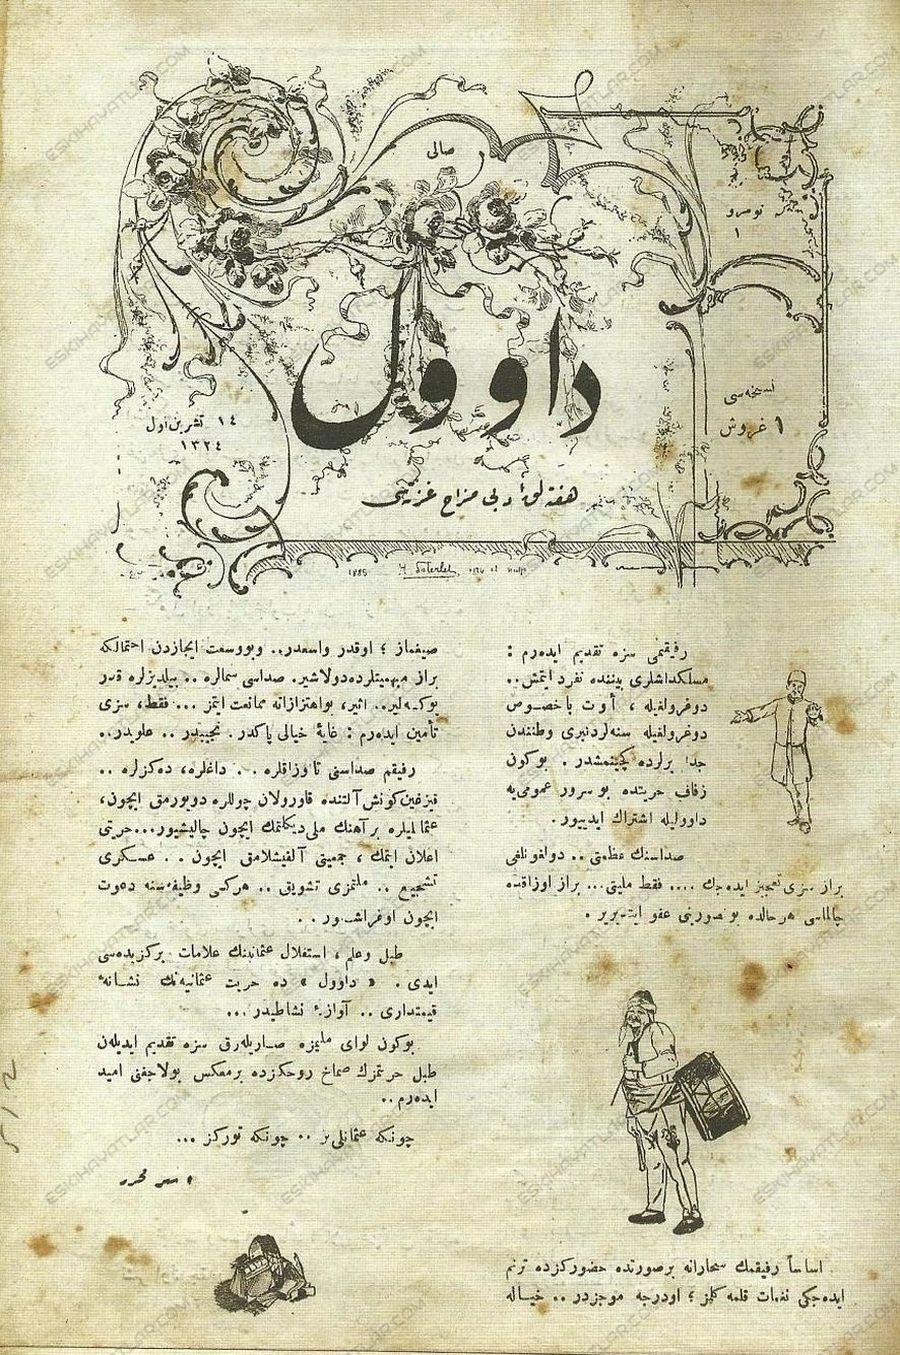 0458-ii-mesrutiyet-1908-yilinda-turkiye-2-mesrutiyet-dokumanlari (4)